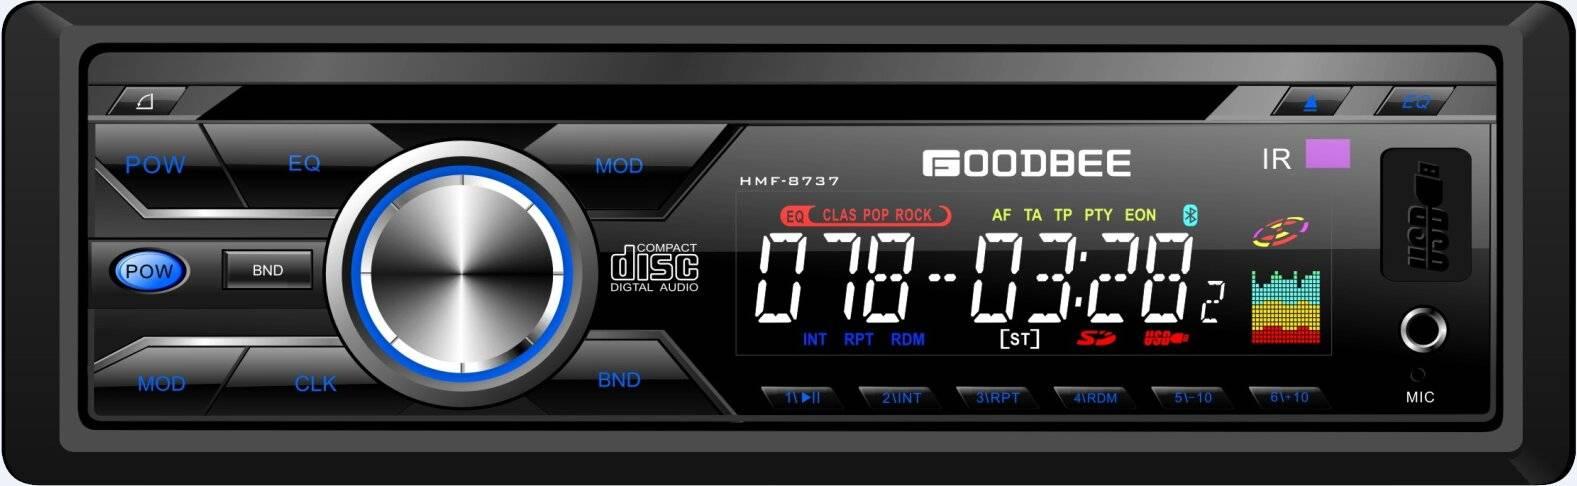 Detachable Panel Car DVD,MP4 Player HMF-8837